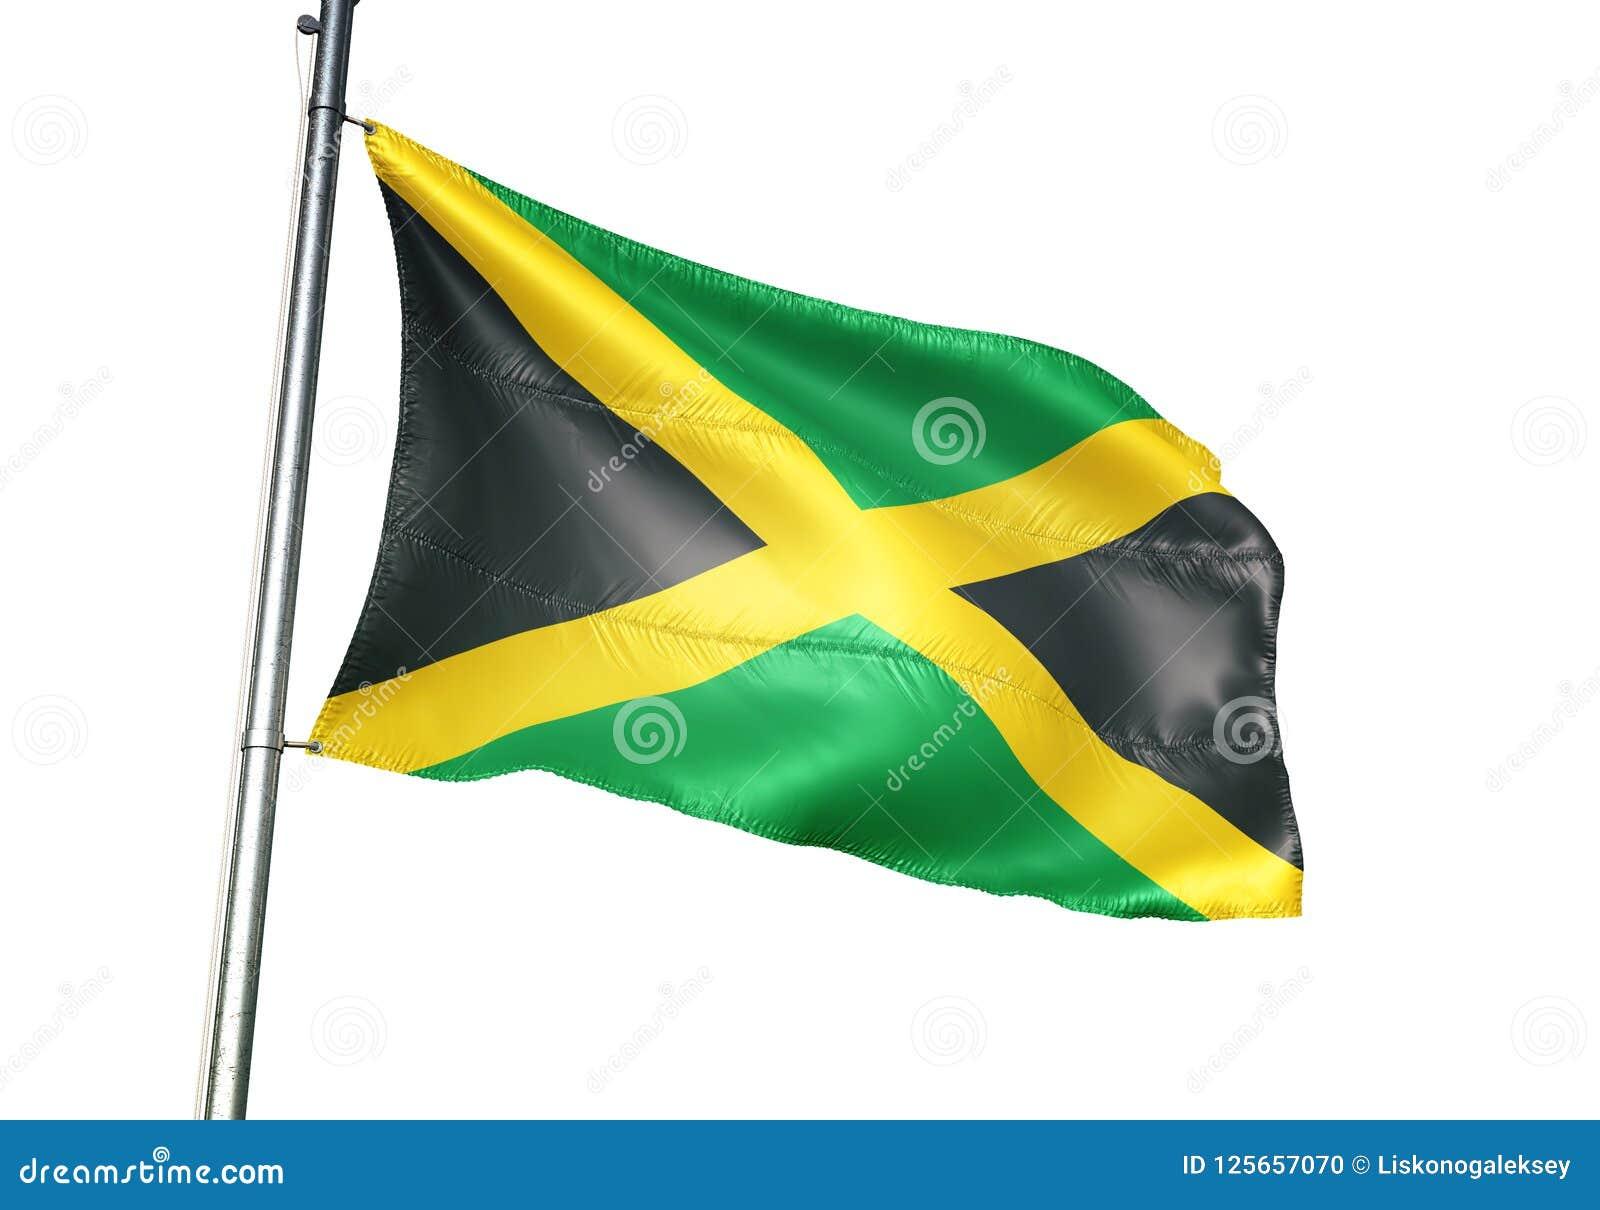 Jamaica national flag waving isolated on white background realistic 3d illustration